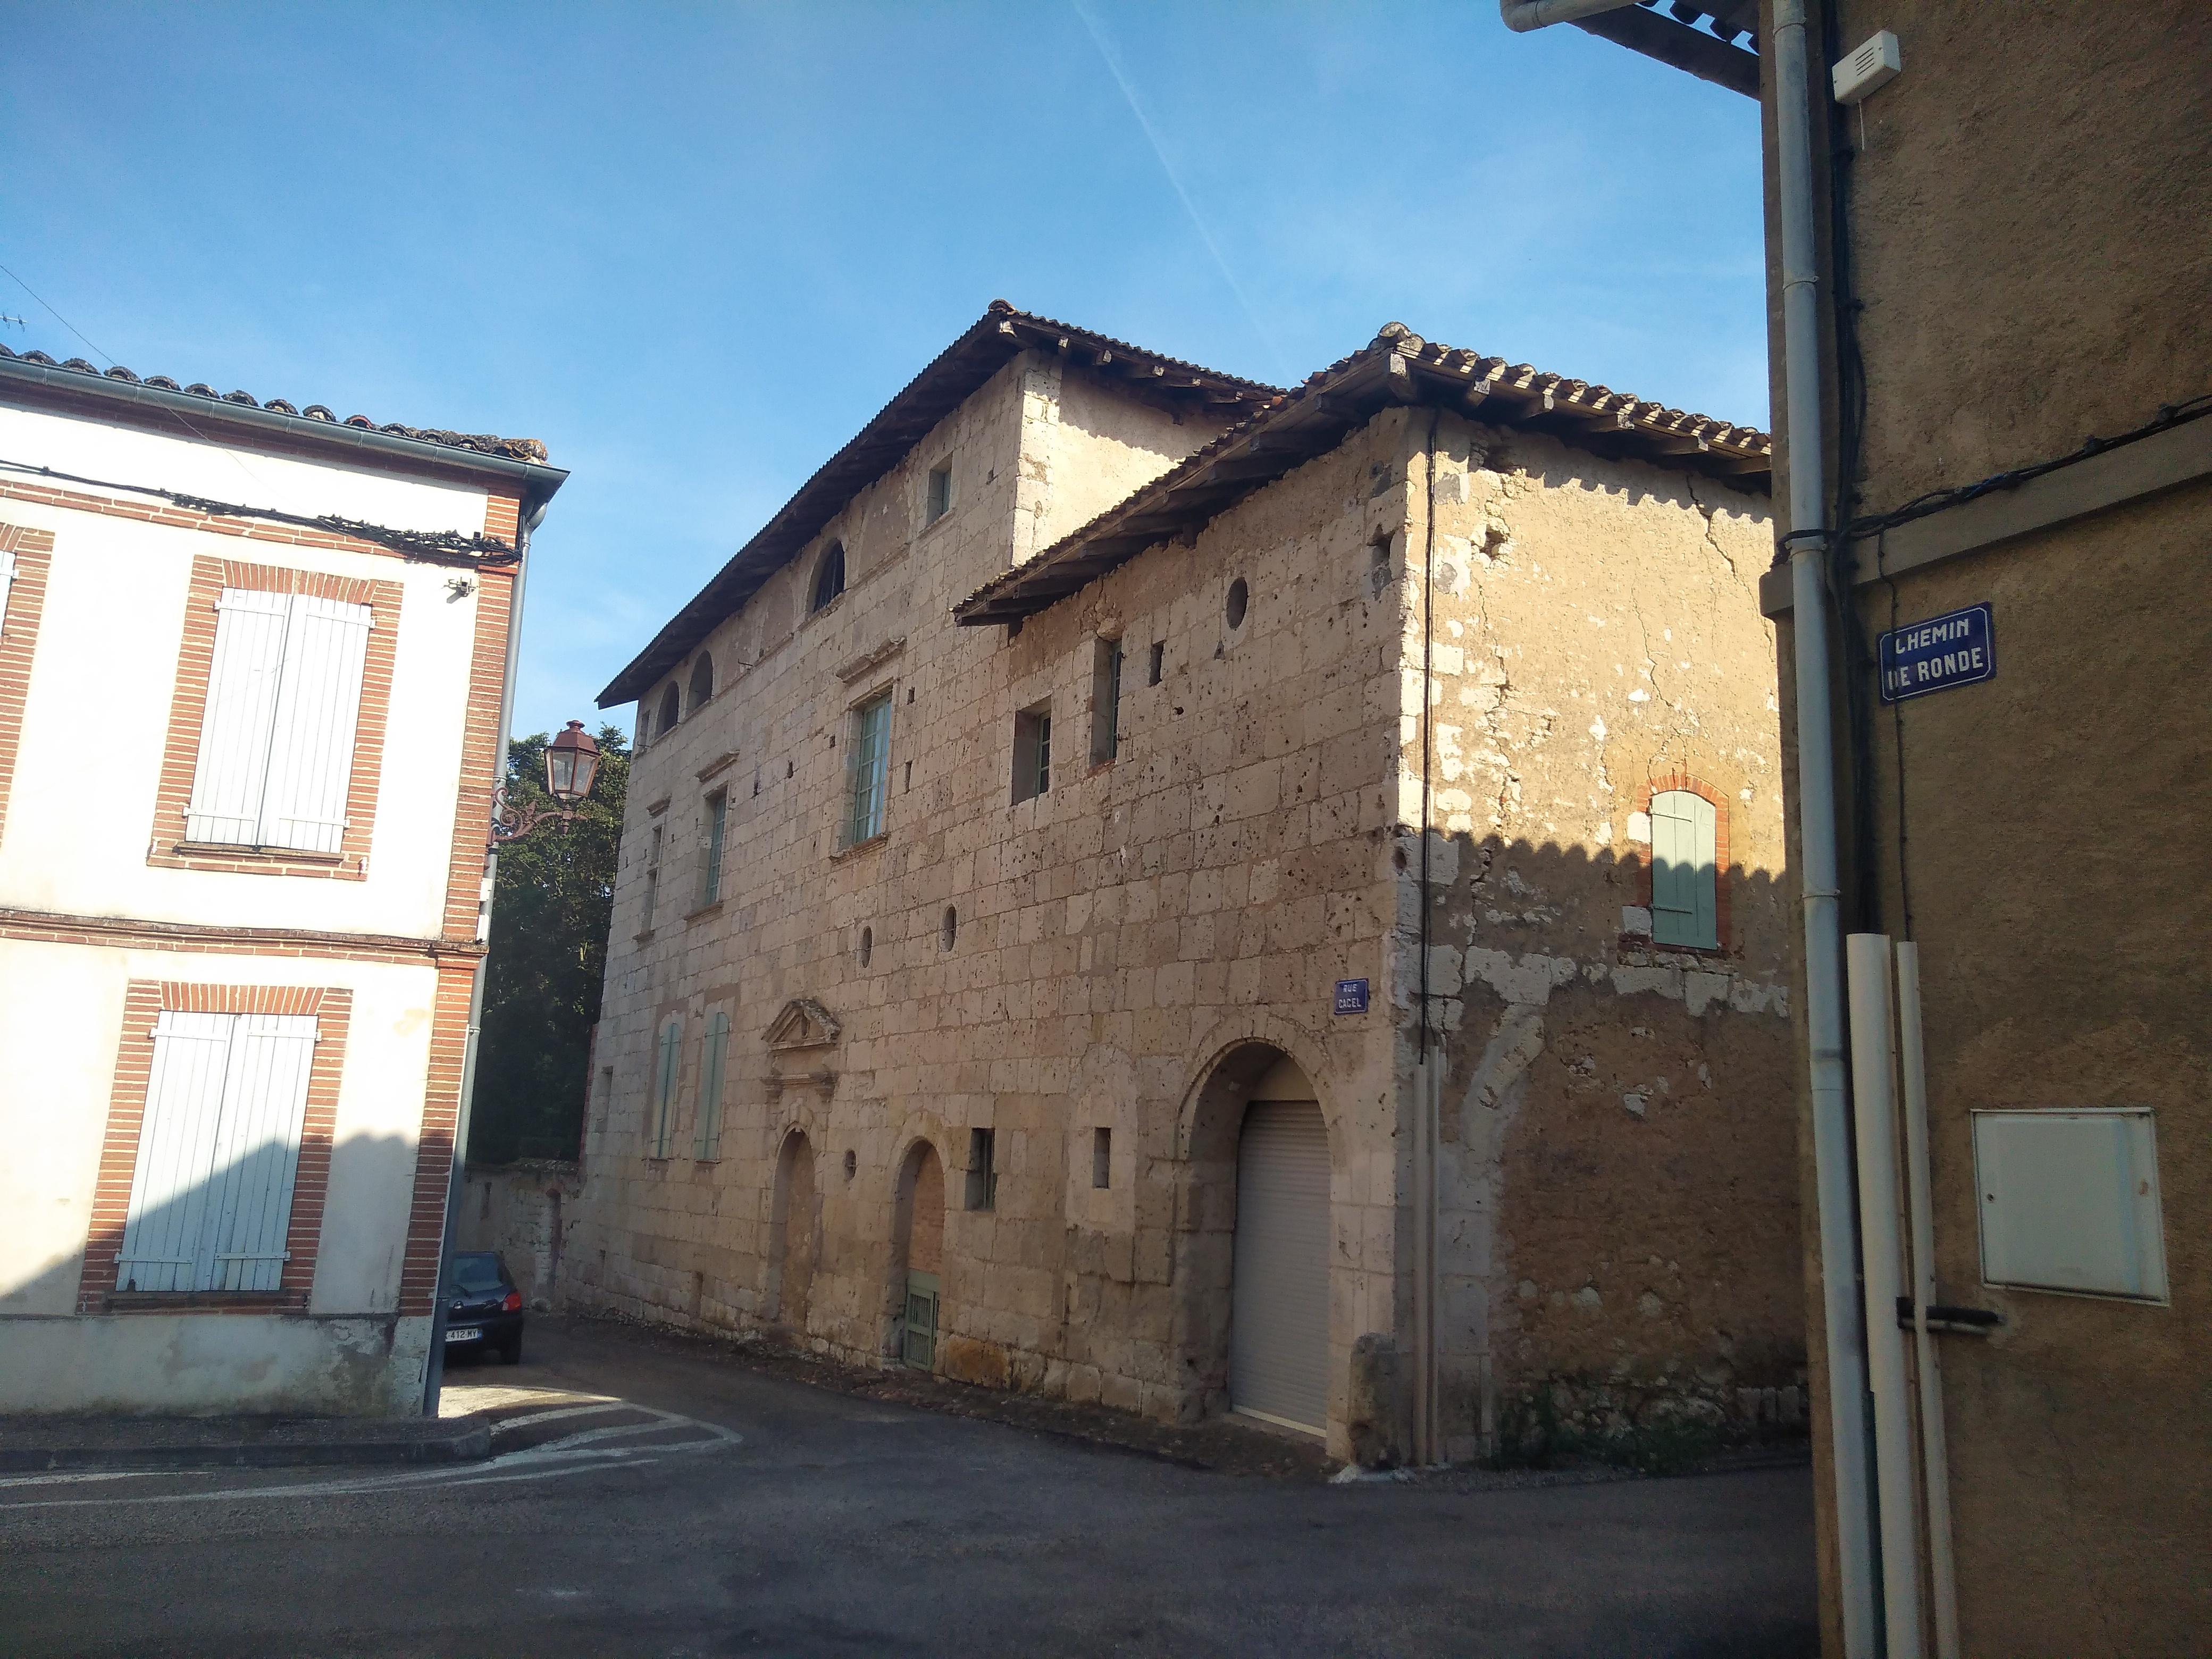 File:Larrazet - maison ancienne 03.jpg - Wikimedia Commons